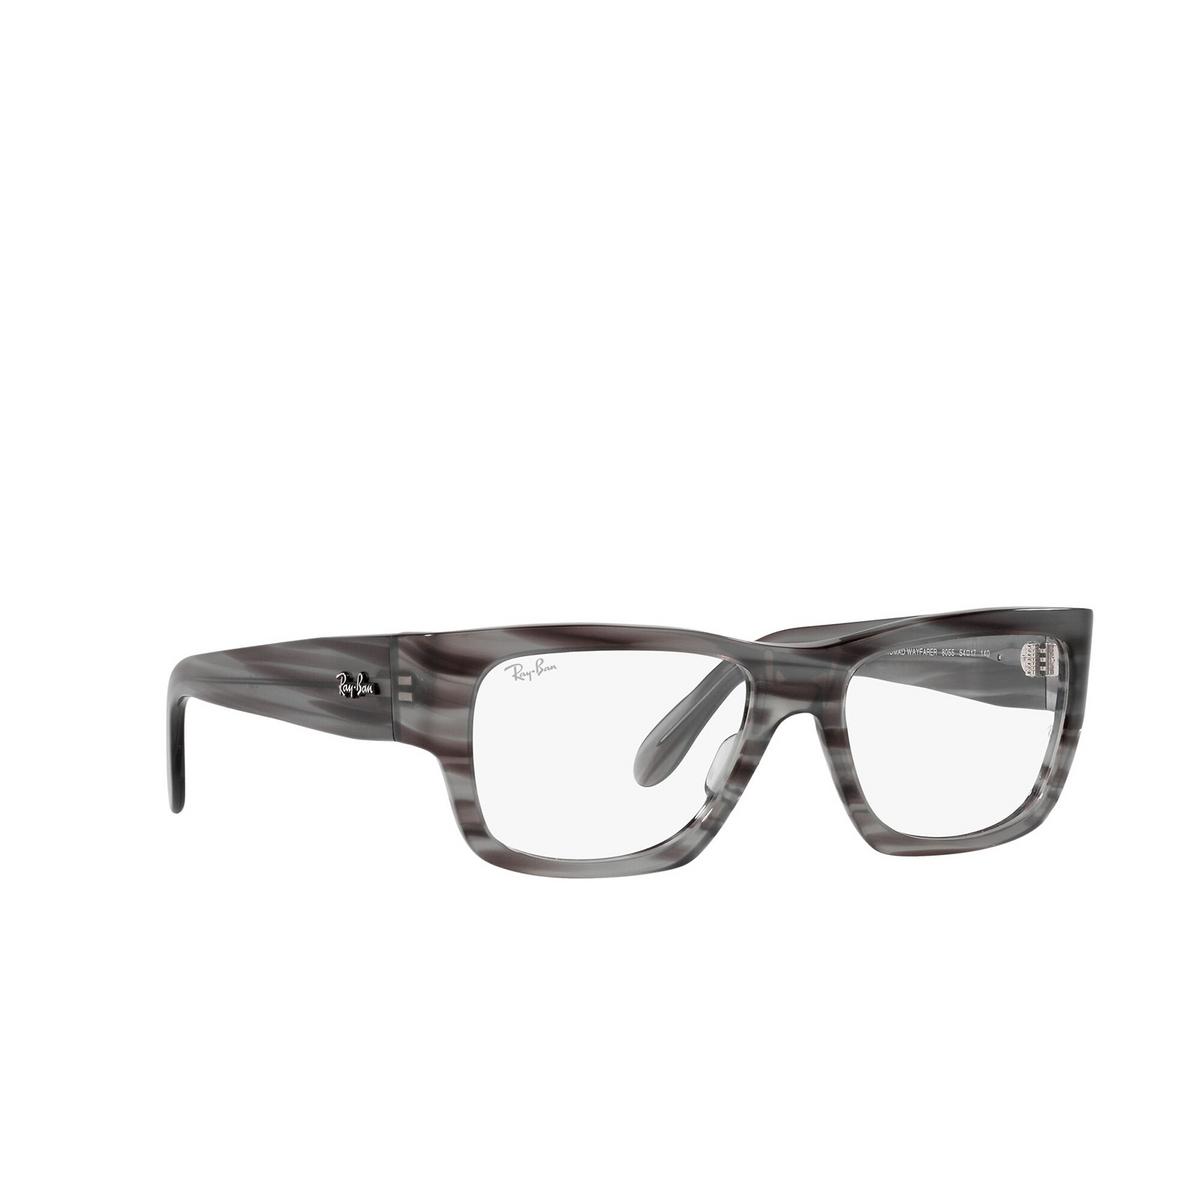 Ray-Ban® Square Eyeglasses: Nomad Wayfarer RX5487 color Striped Grey 8055 - three-quarters view.